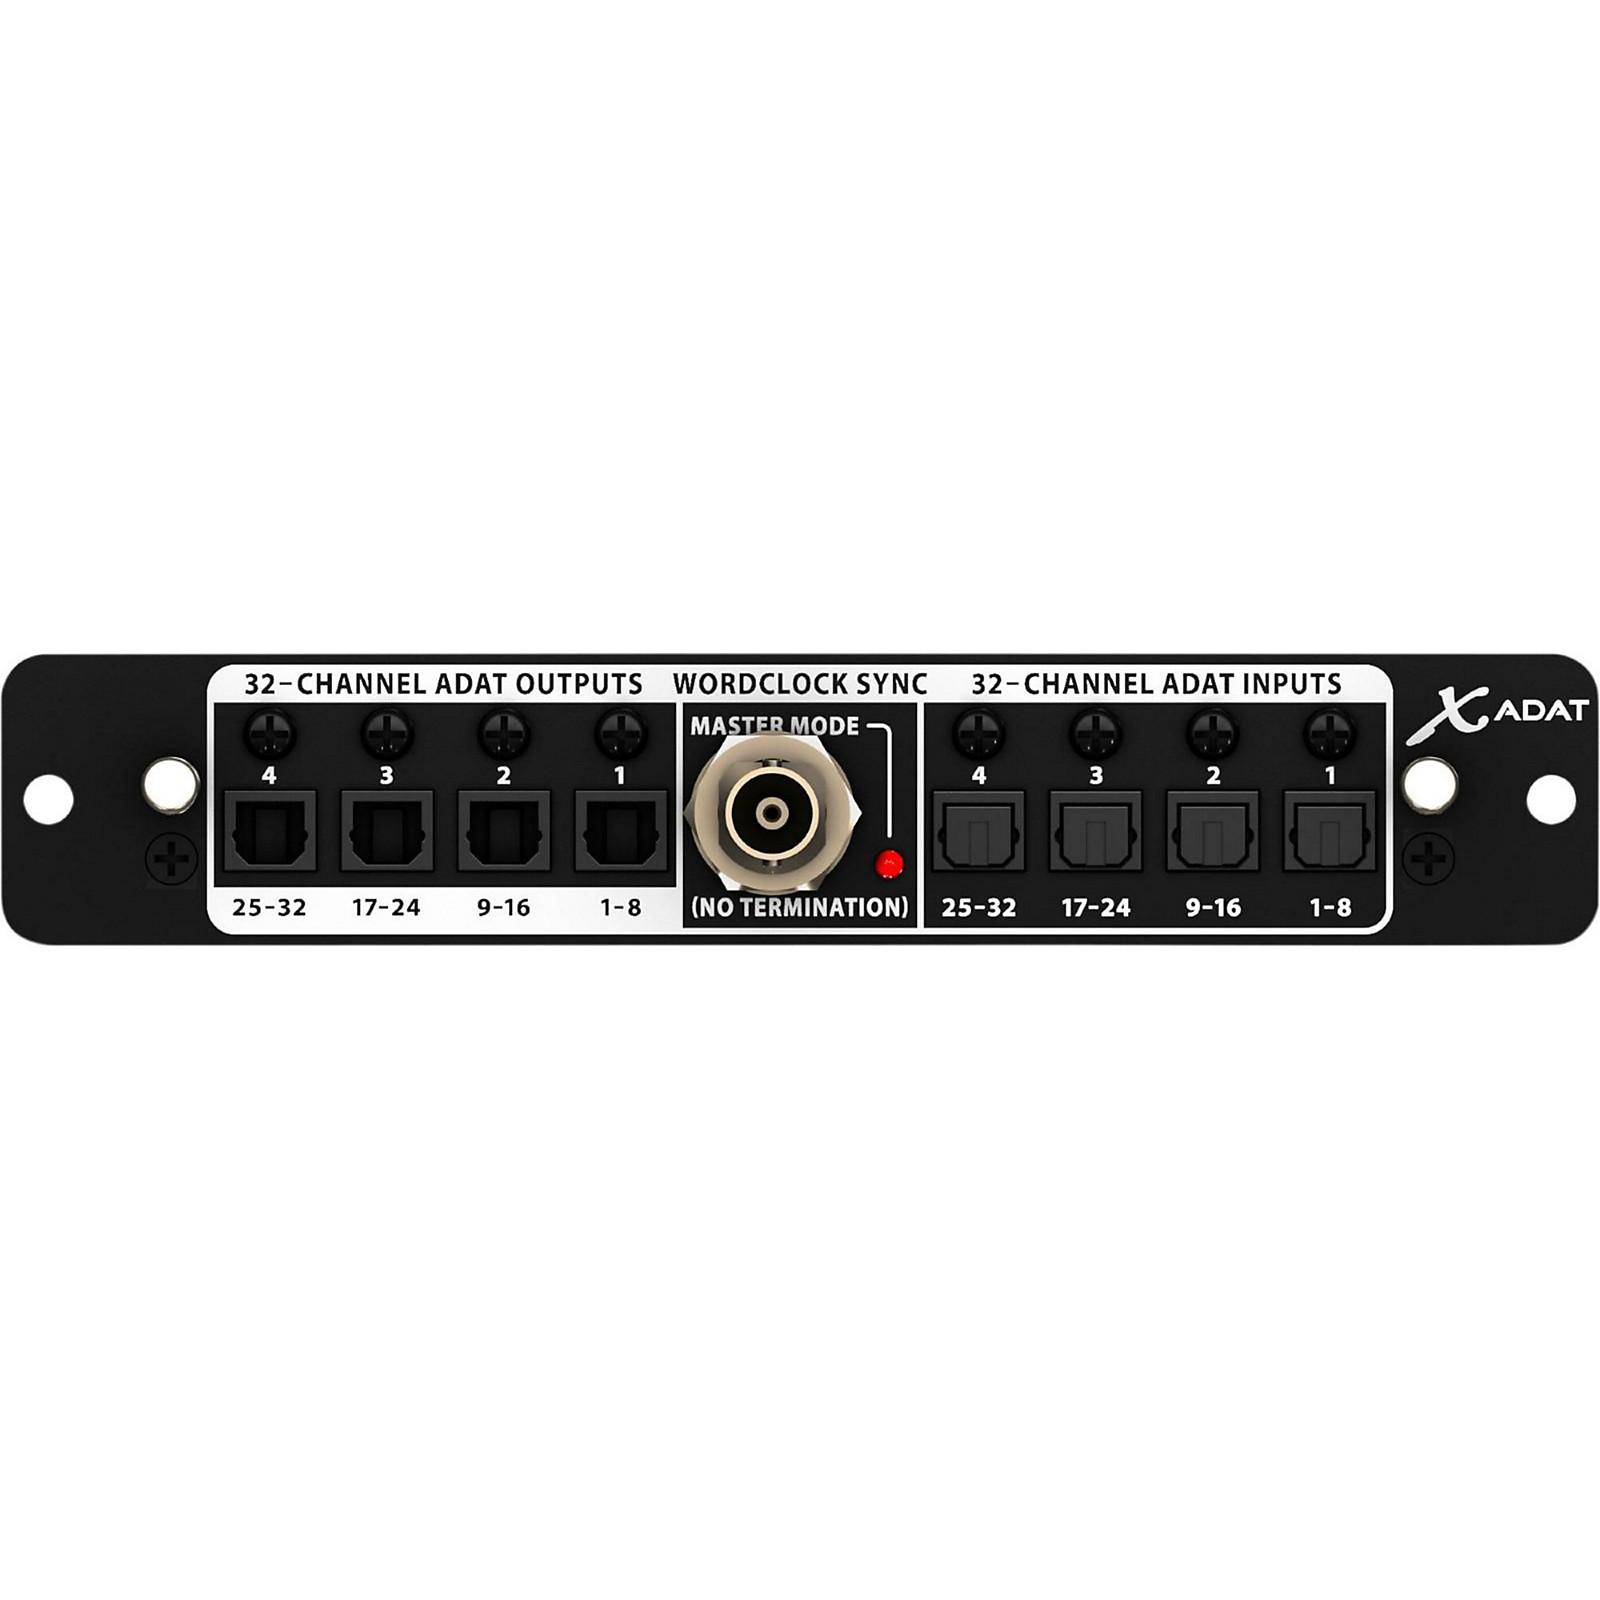 Behringer Digital Mixer Option X-ADAT